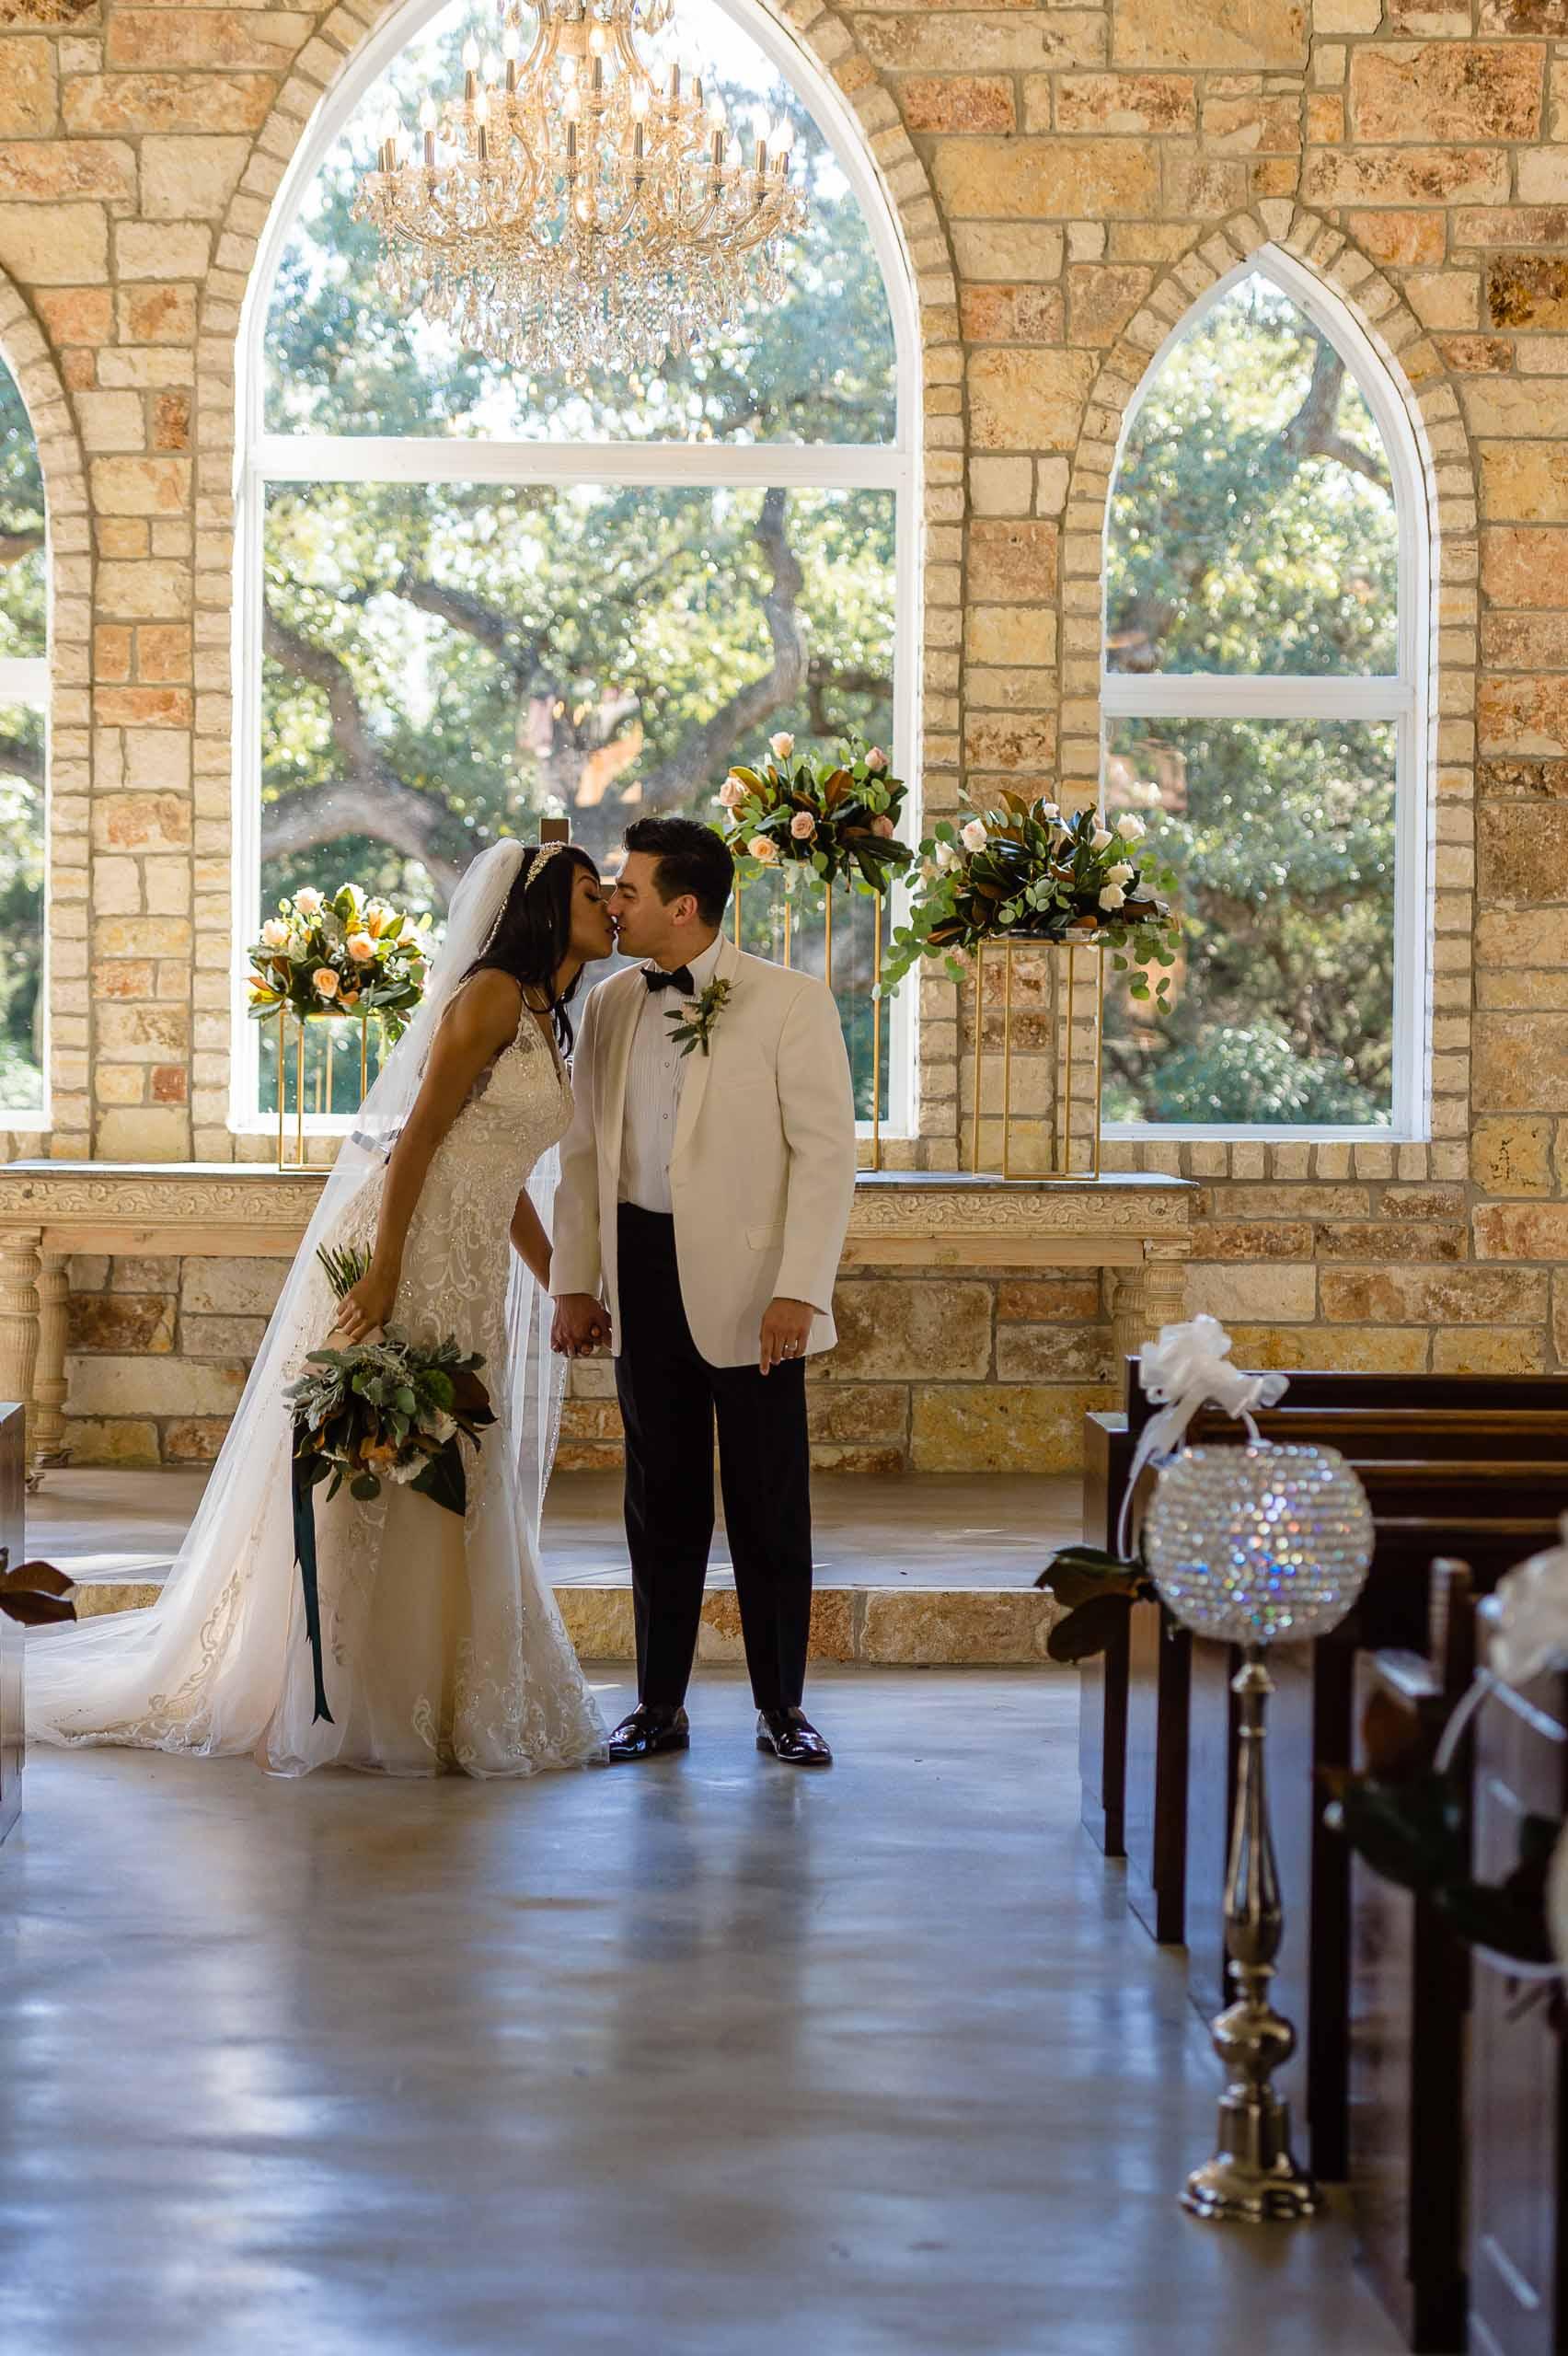 chandelier-of-gruene-winter-wedding-inspiration-_4S15621